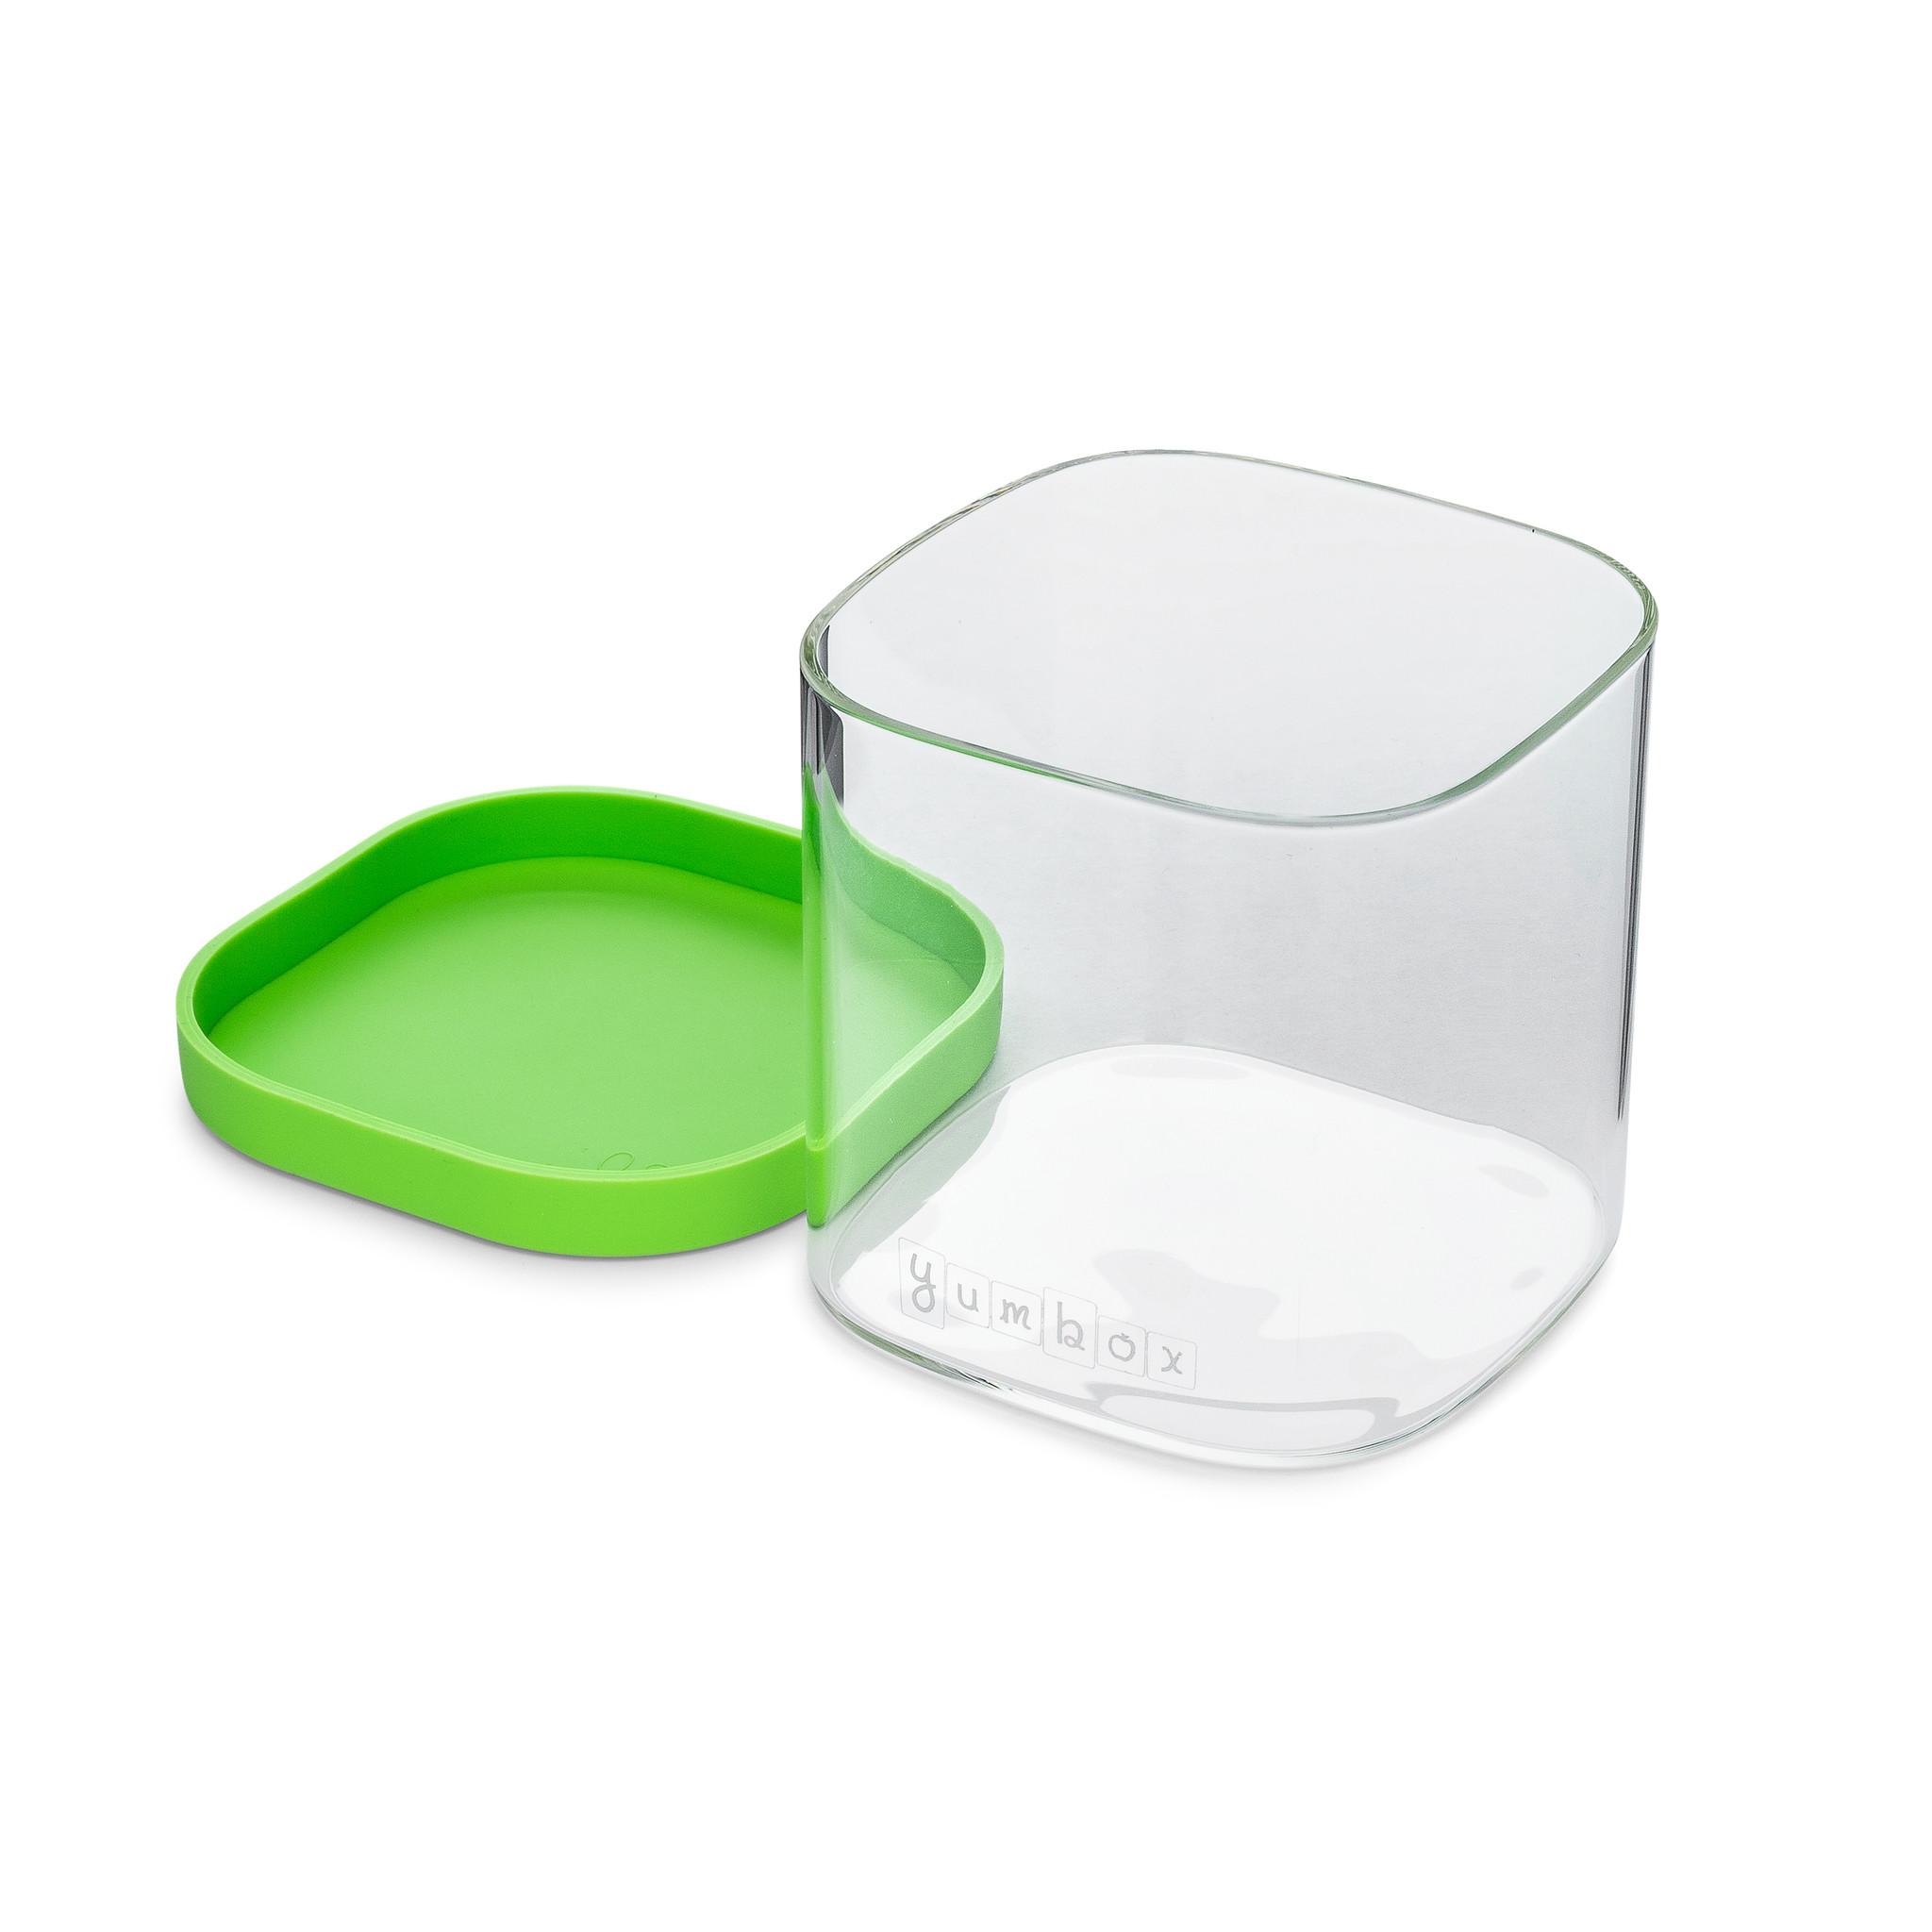 Yumbox Chop Chop 3 glass cubes Vibrant-7